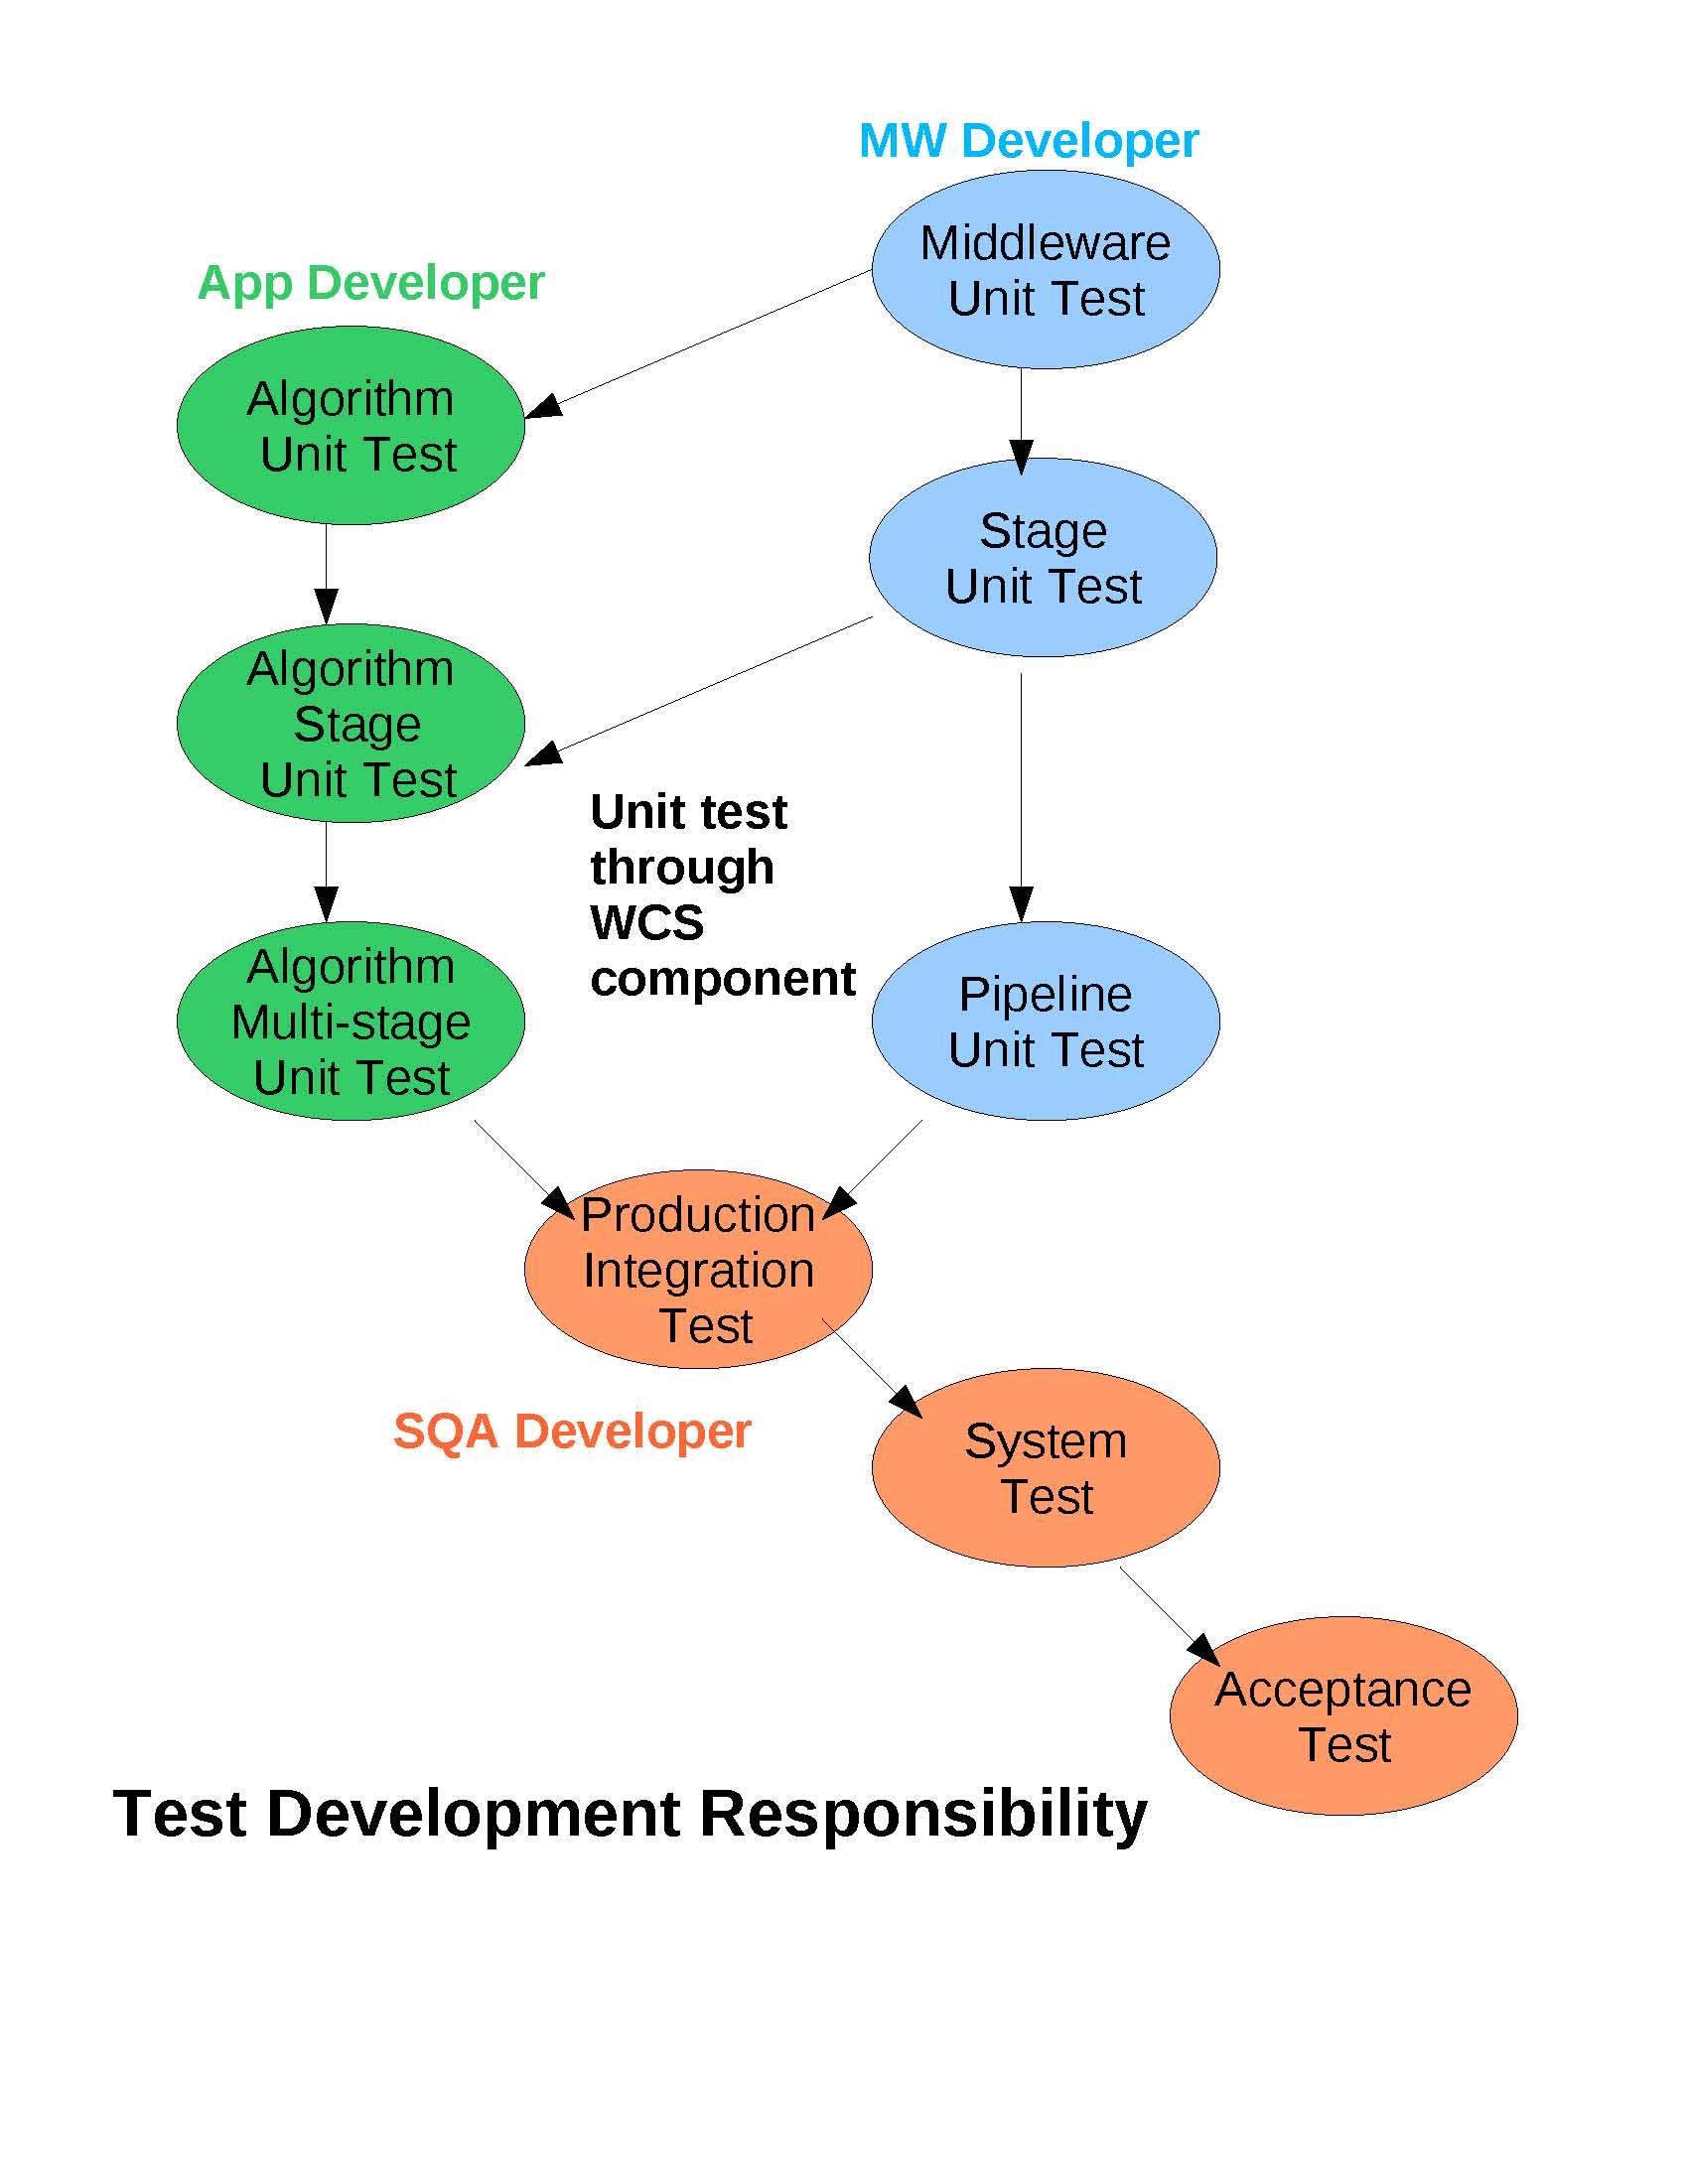 Test Development Responsibility